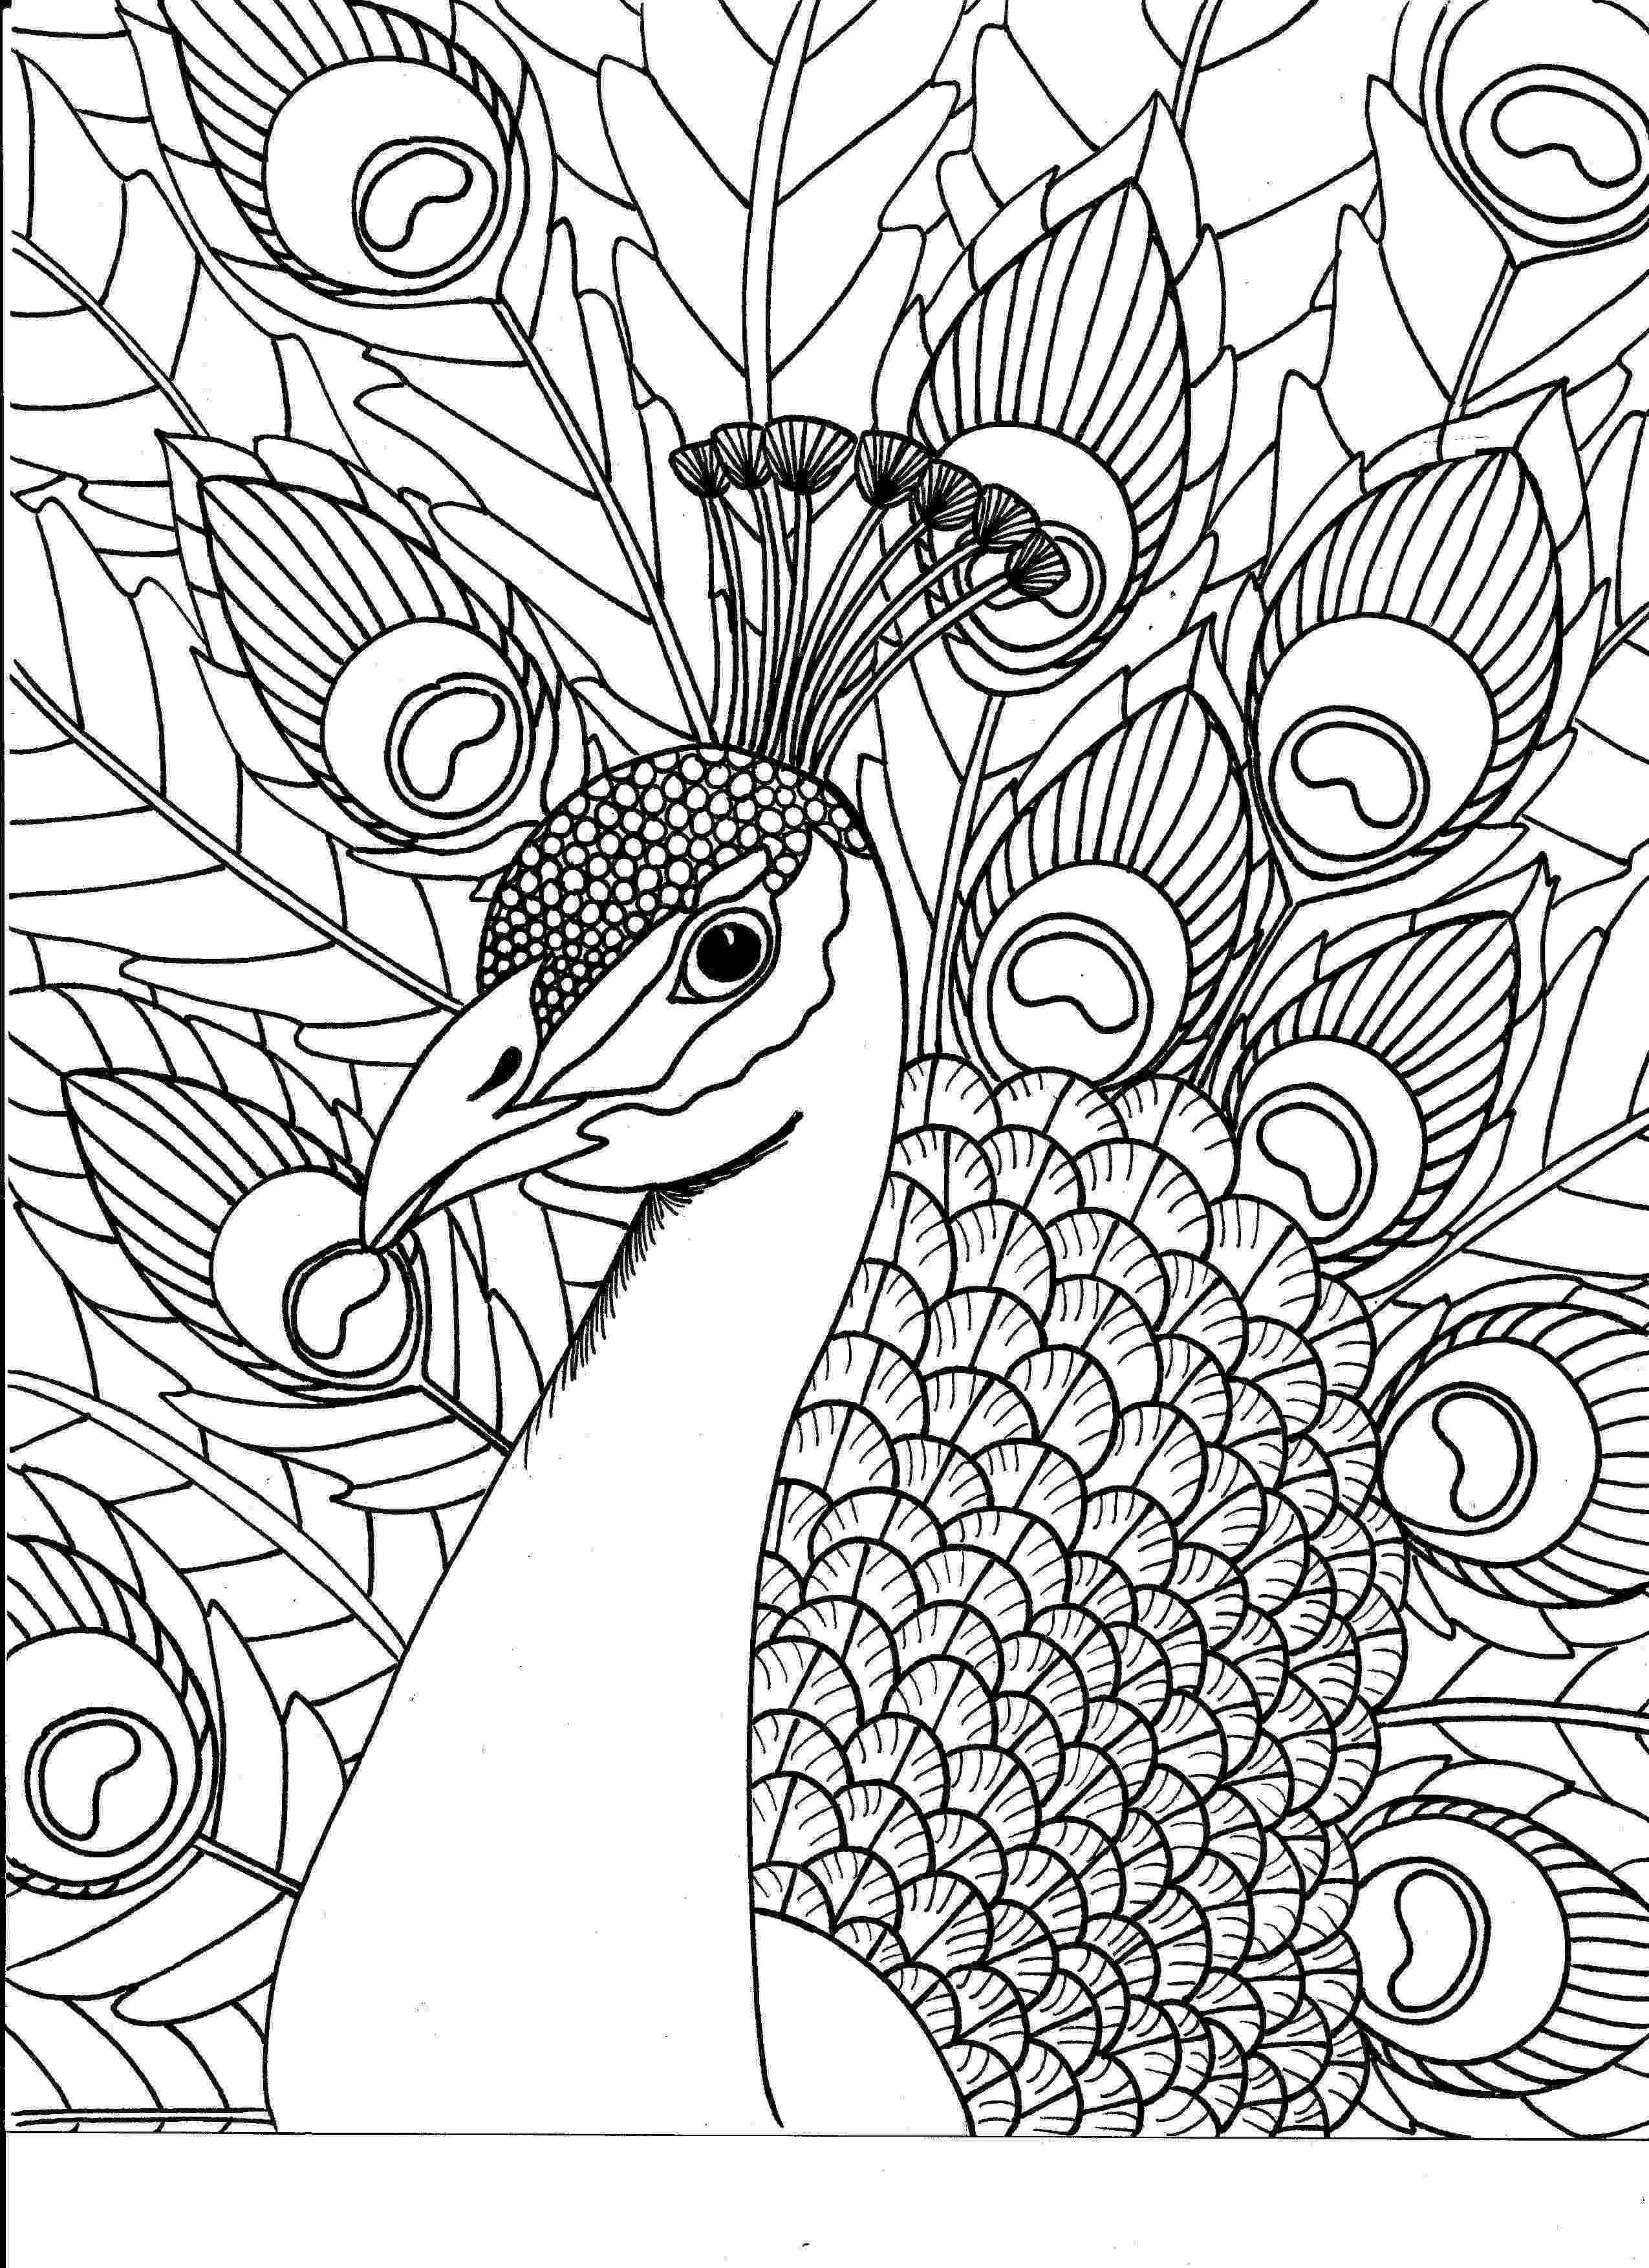 animal kingdom colouring book peacock beautiful peacock adult colouring adult colouring kingdom peacock colouring book animal